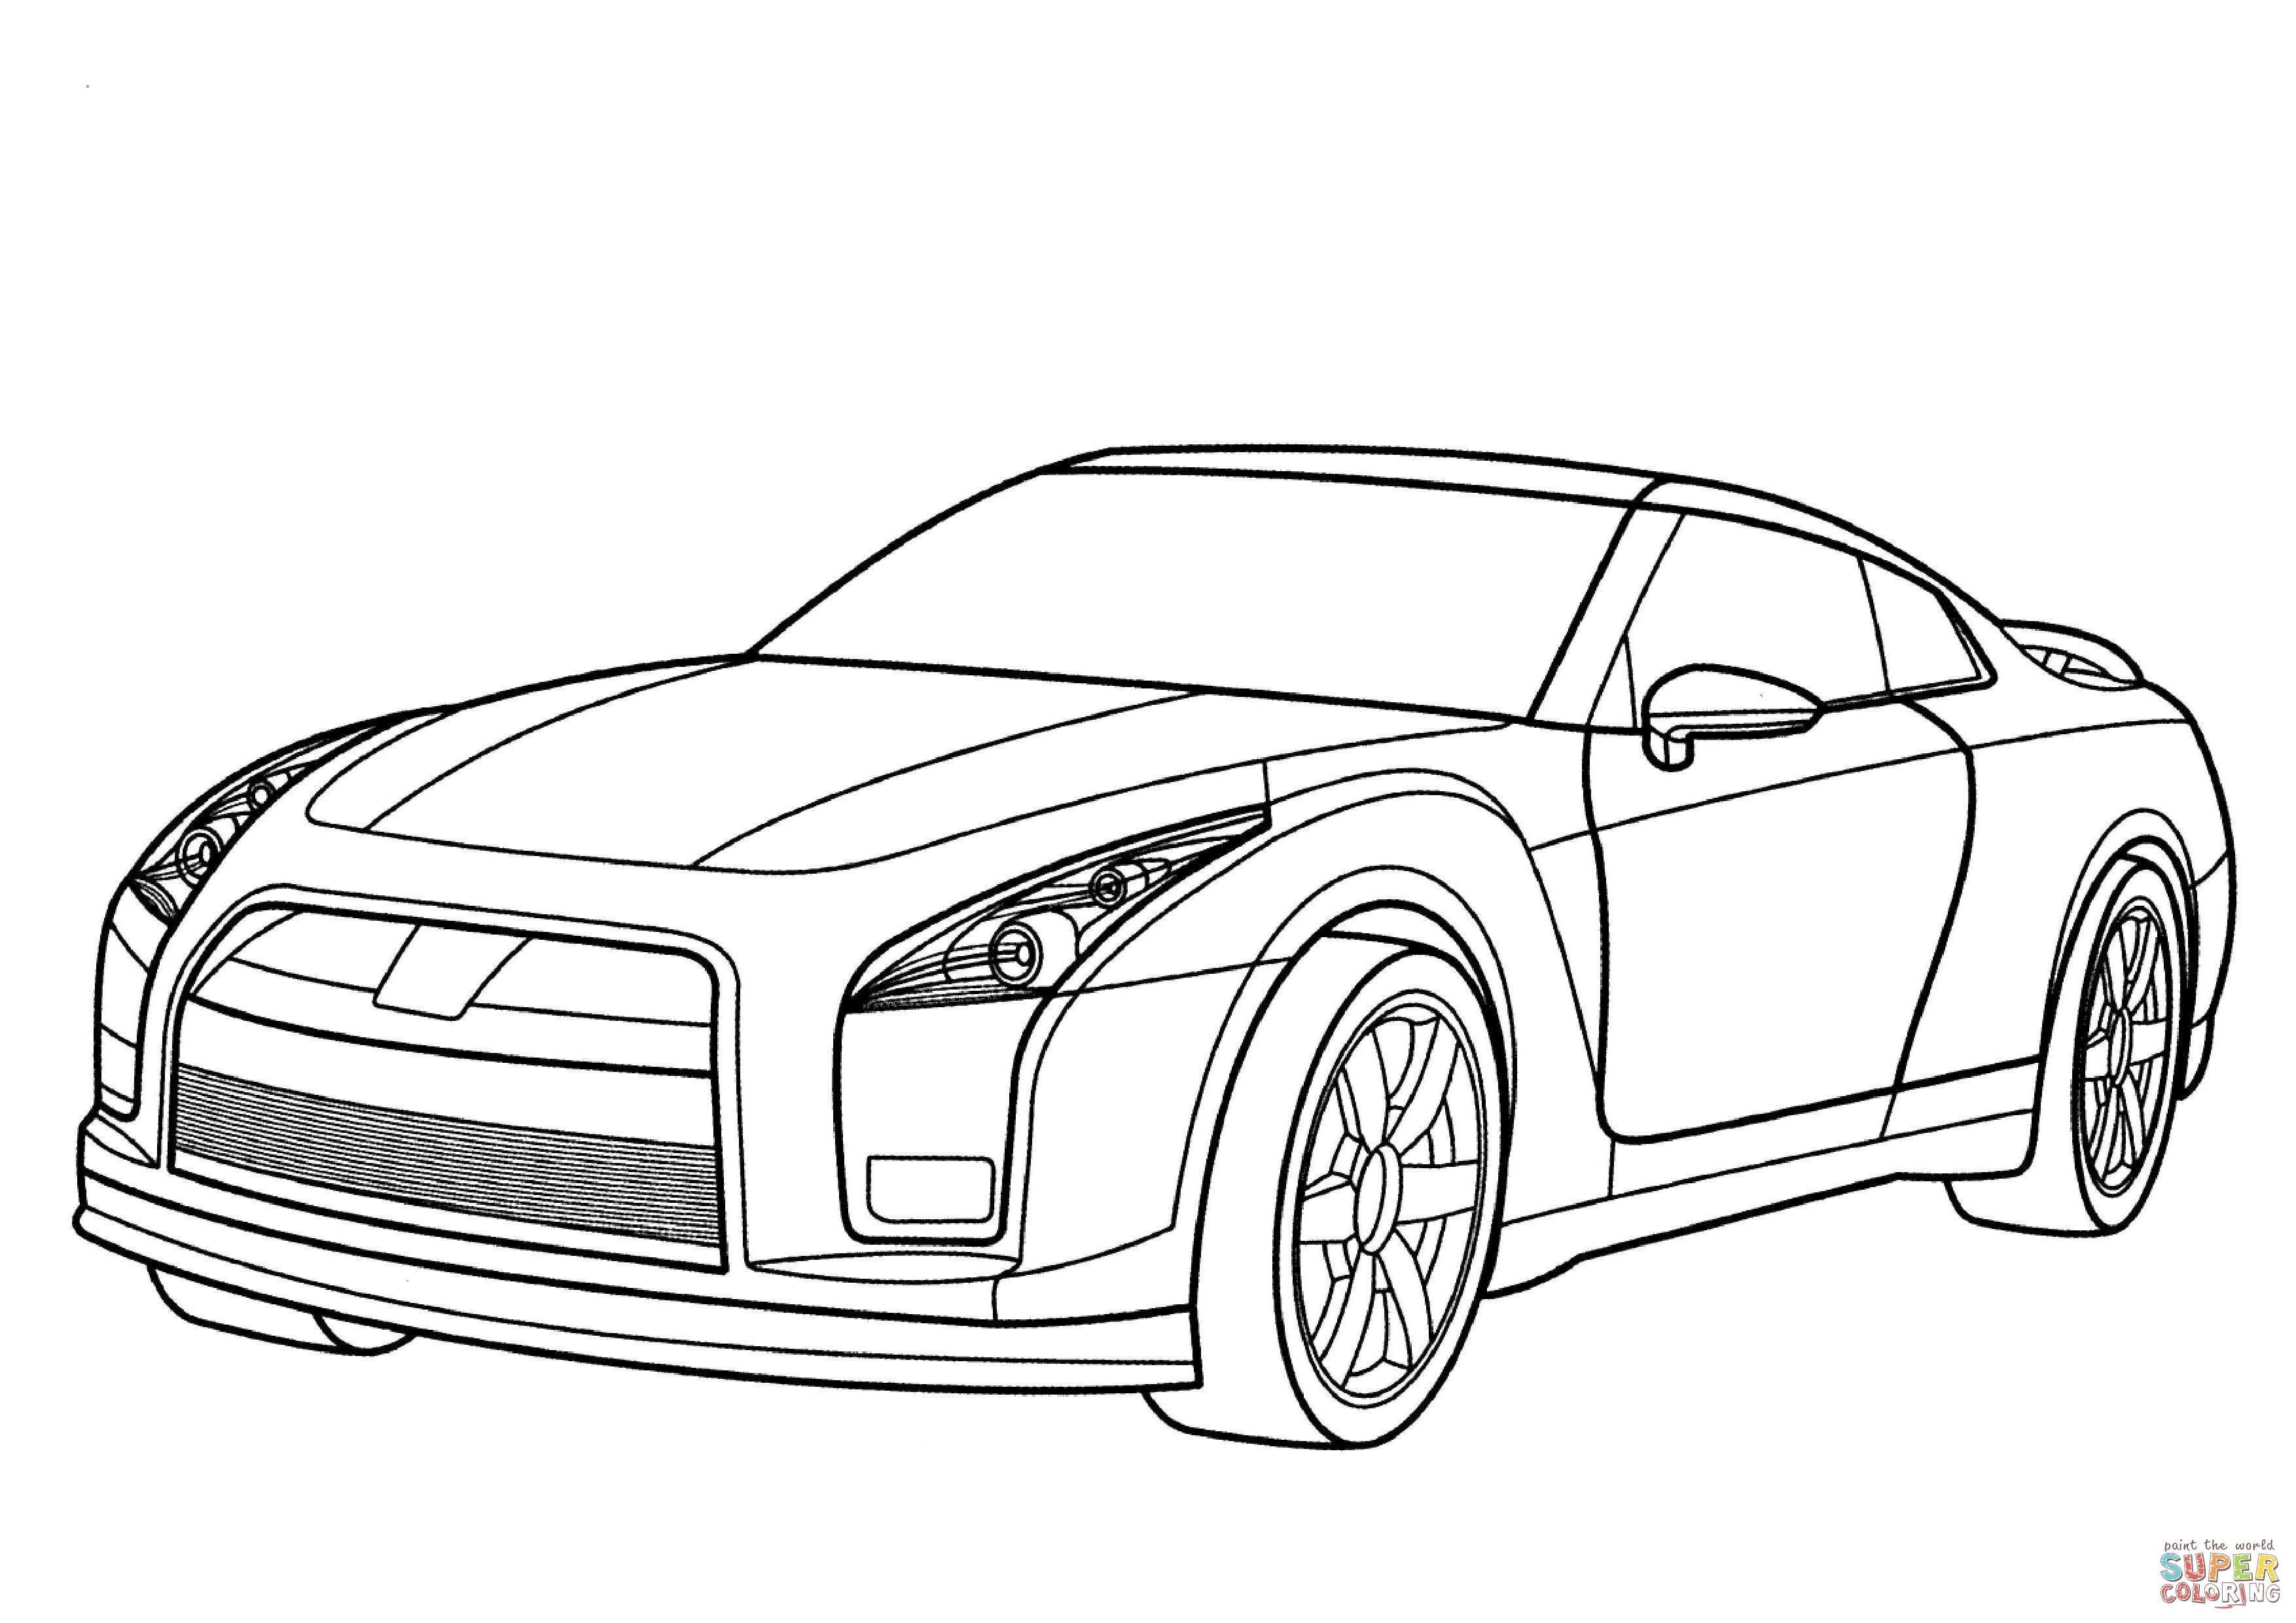 Nissan Gtr Kleurplaat Gratis Kleurplaten Printen Cars Coloring